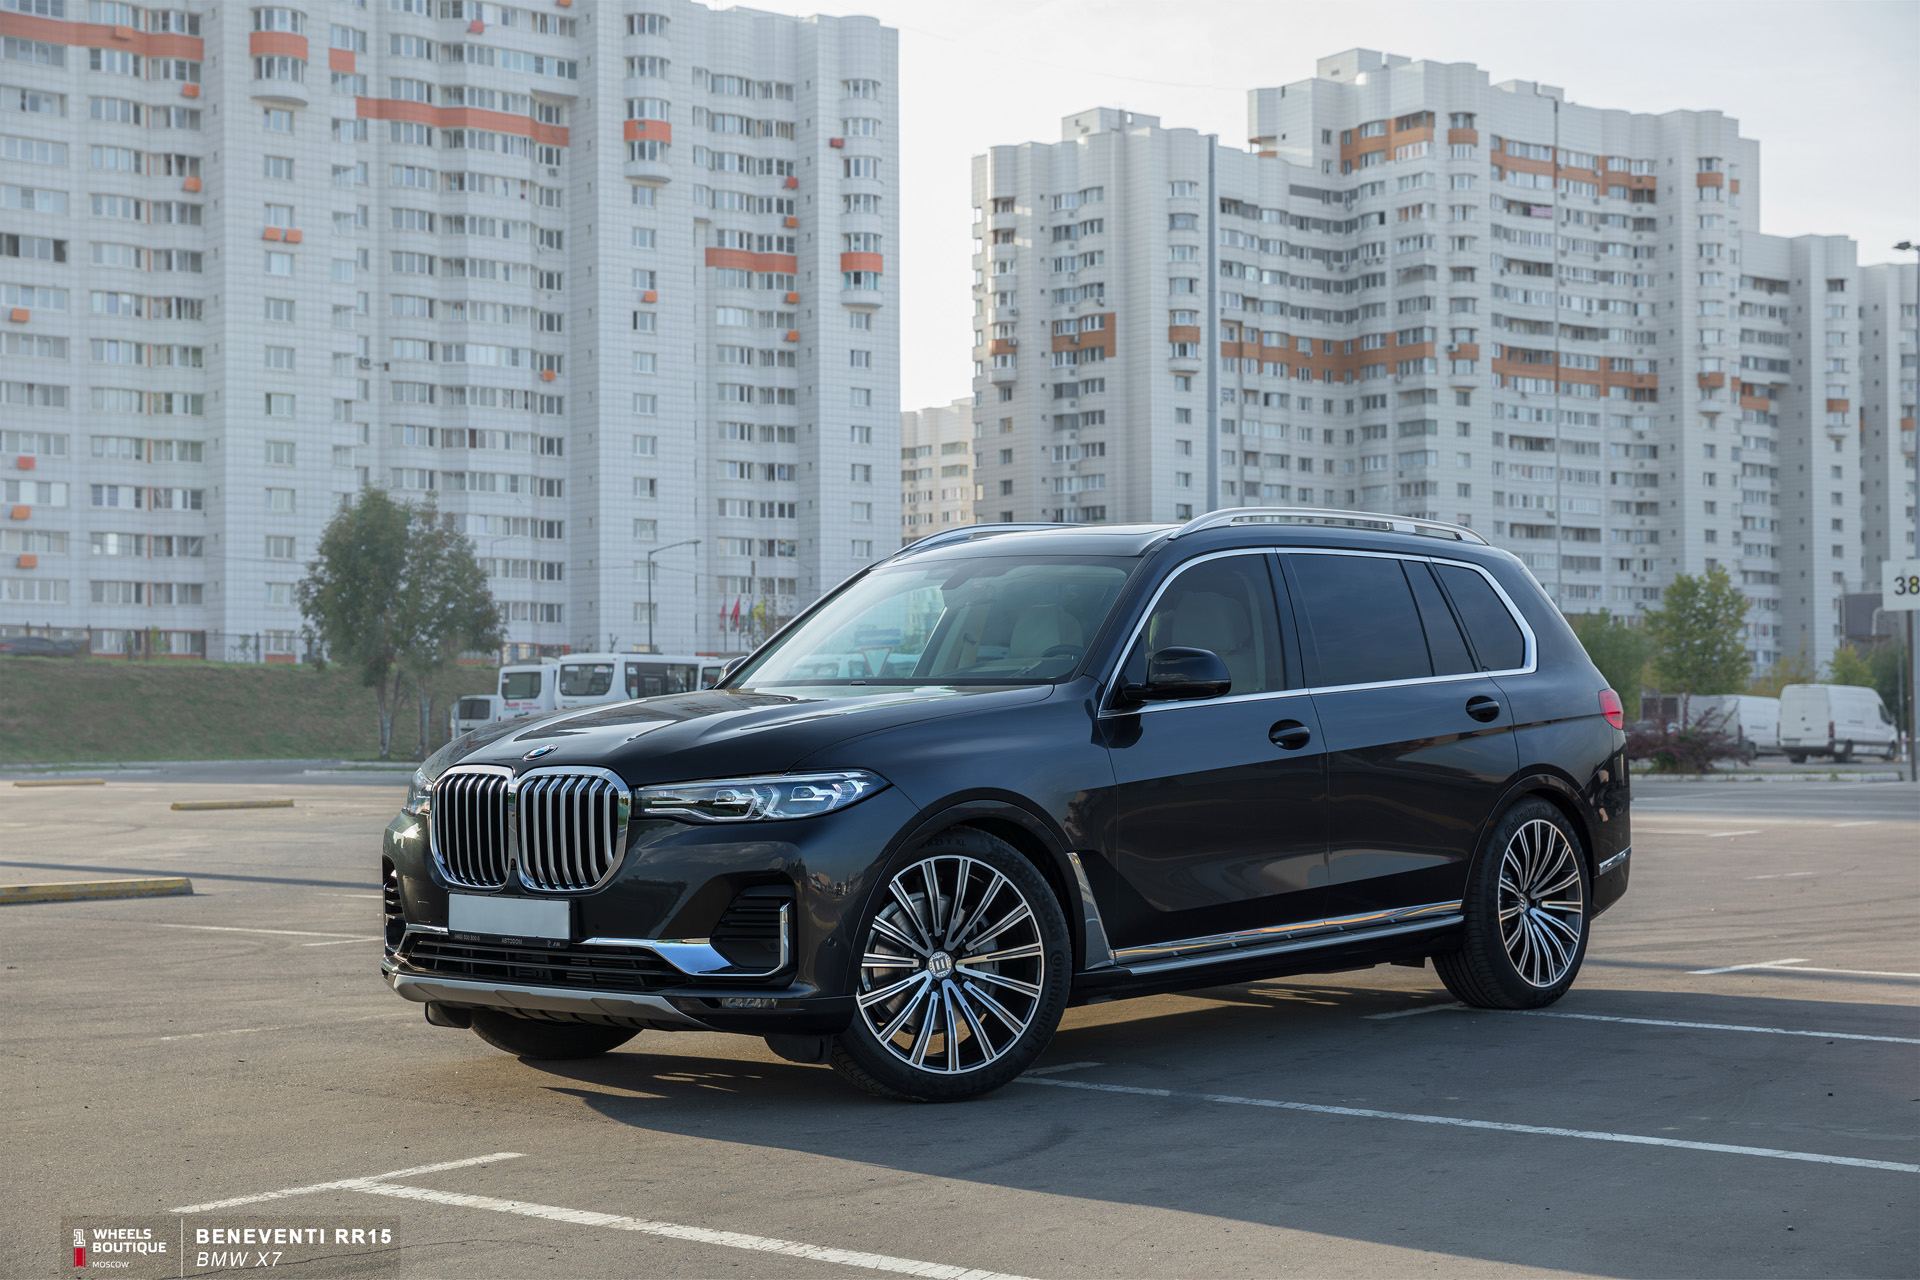 BMW x7 r22